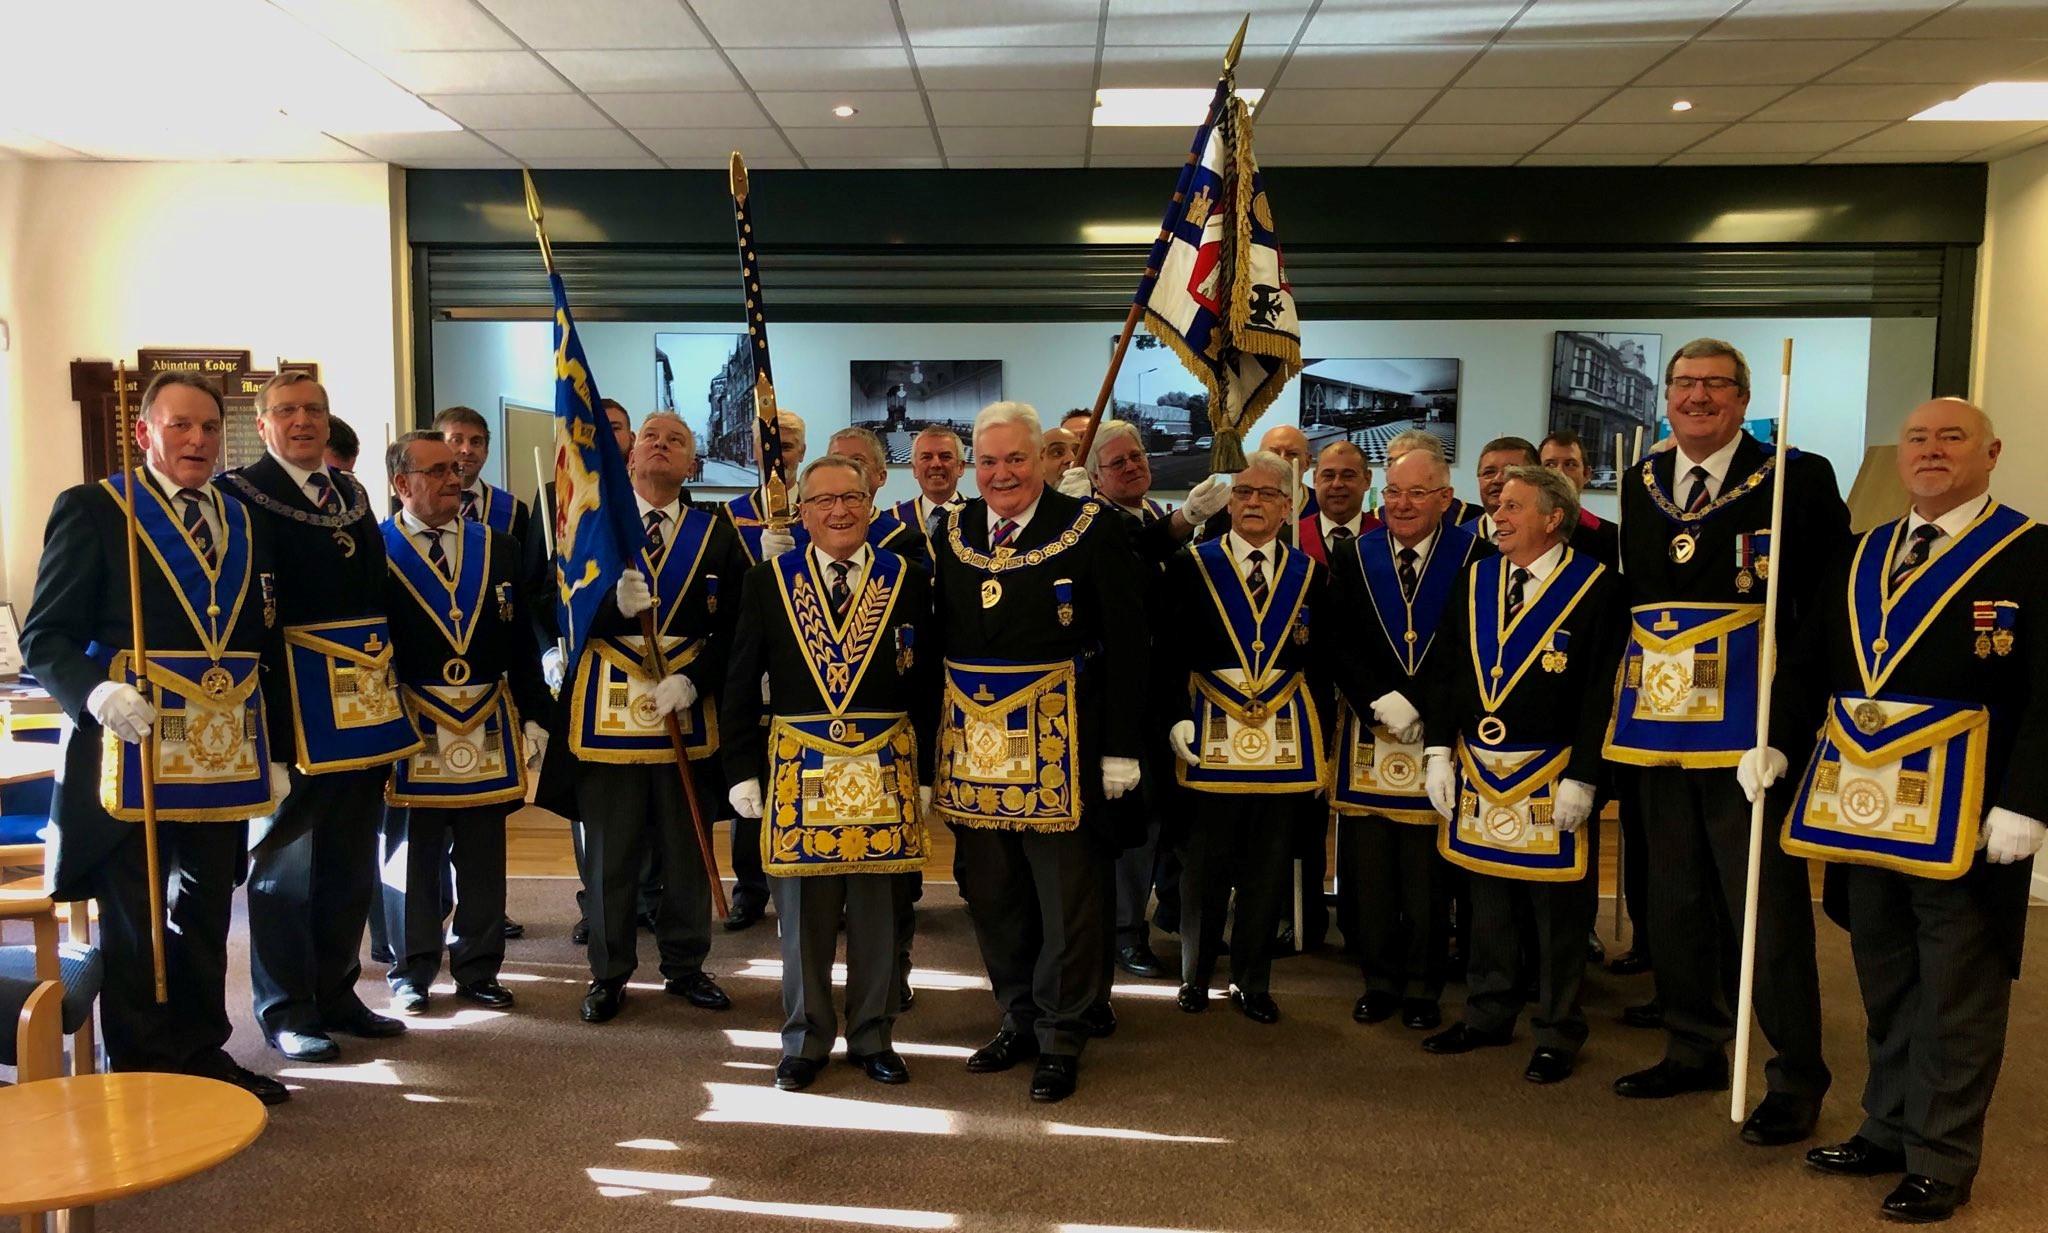 Lovells Bury Lodge Centenary Meeting